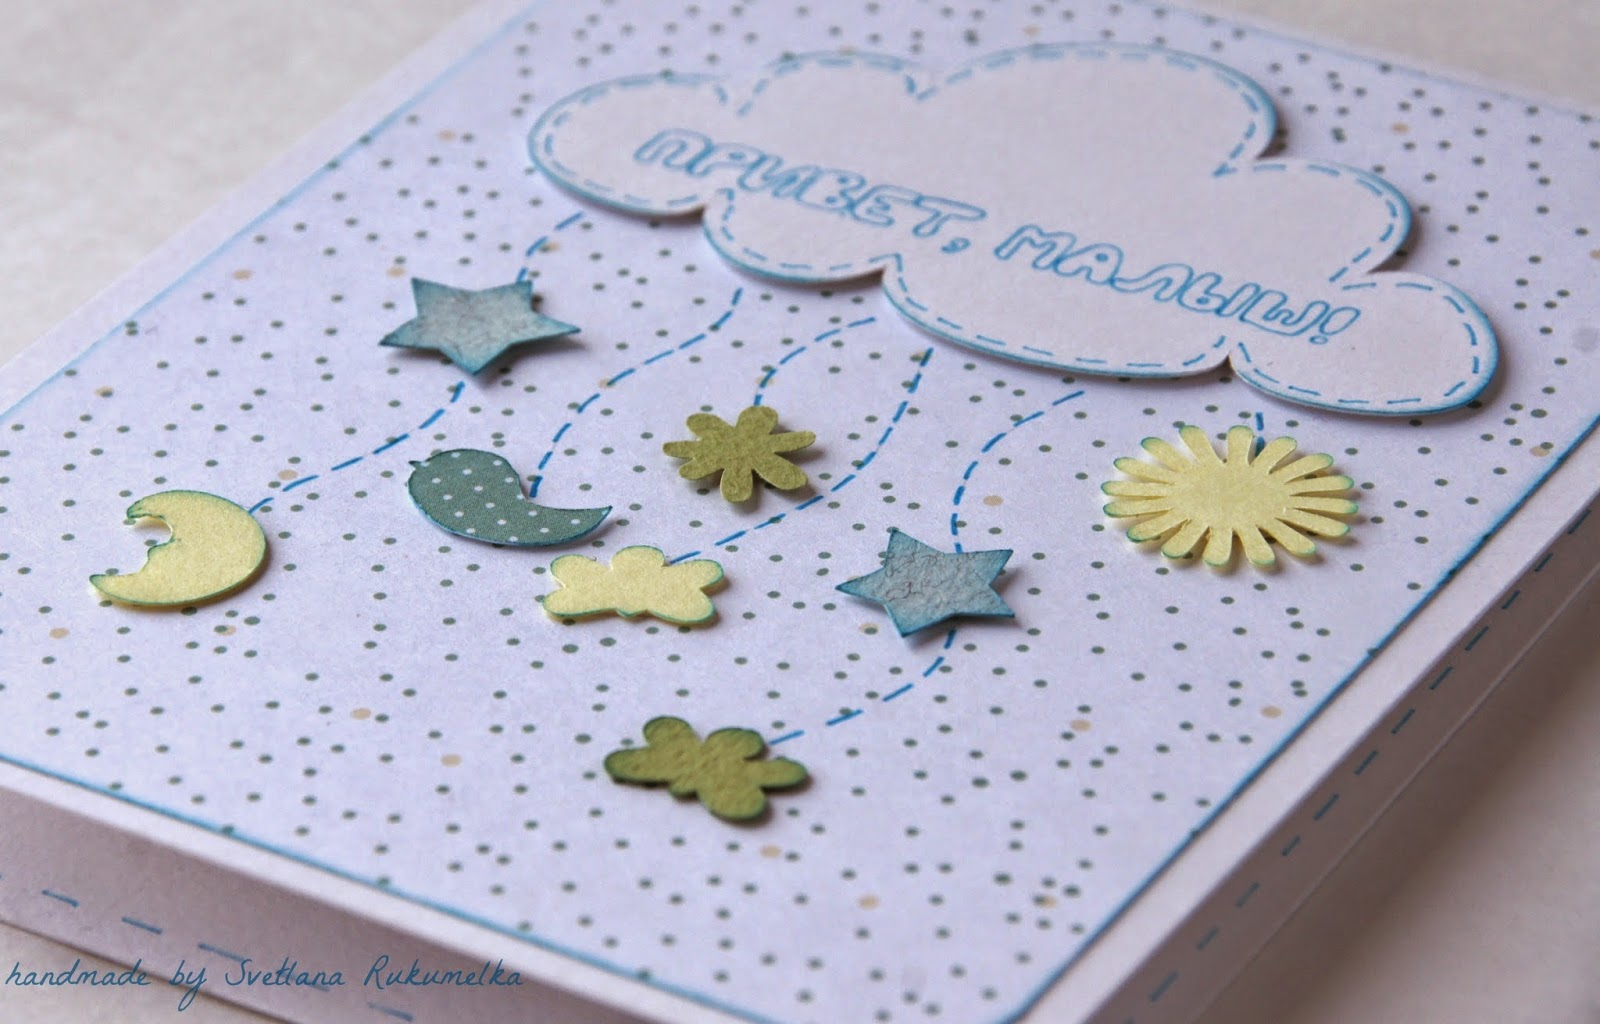 голубой, звездочки, бабочки, солнышко, месяц, птичка